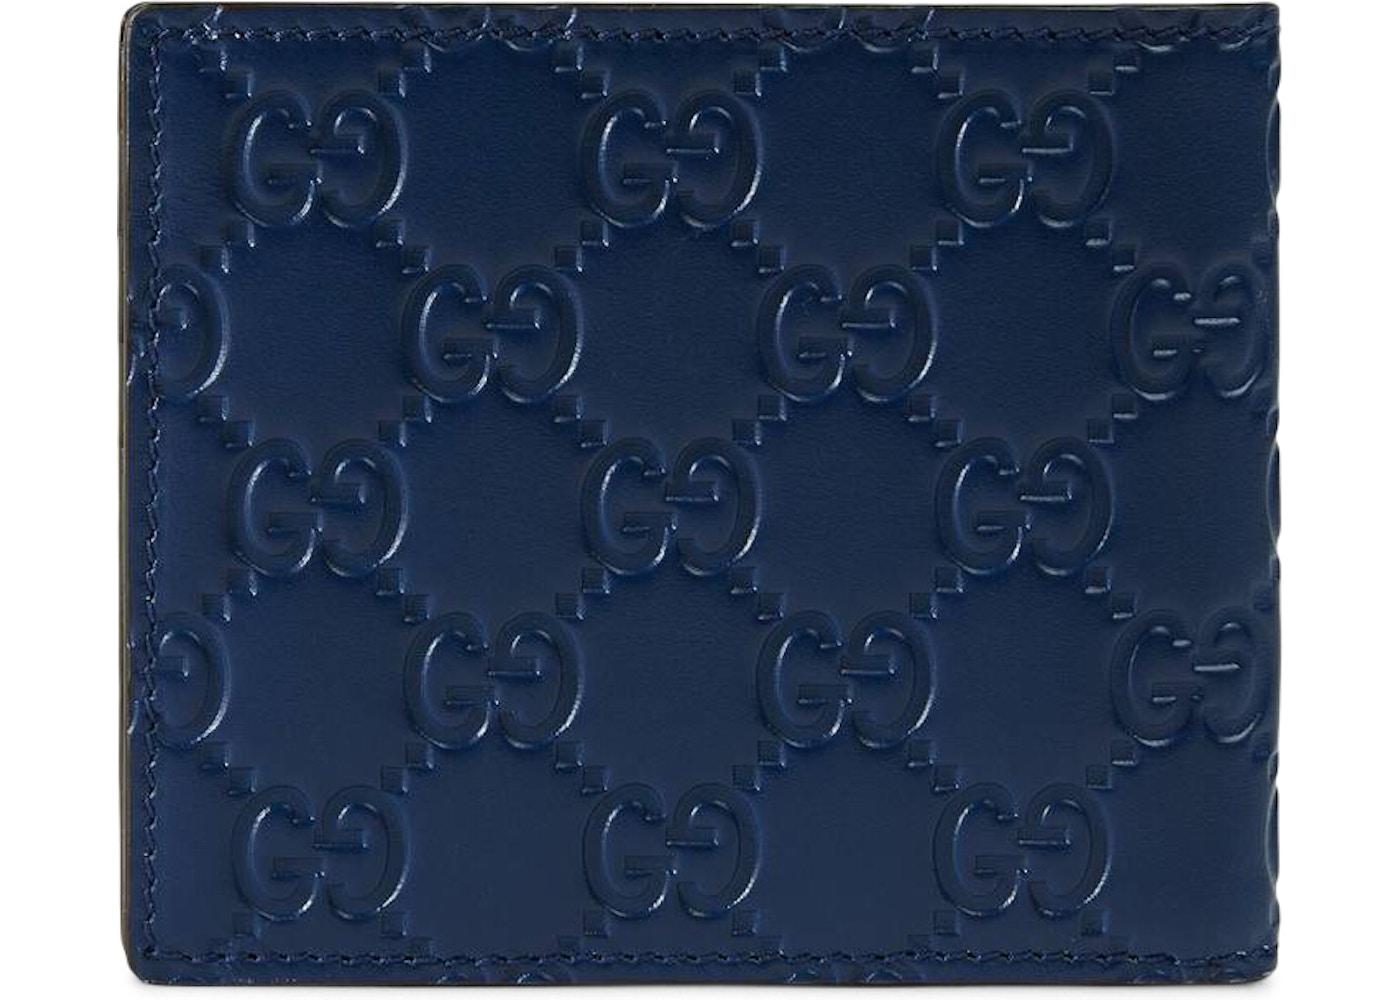 a6bcf01bc7ec Gucci Wallet NY Yankees Patch Royal Blue